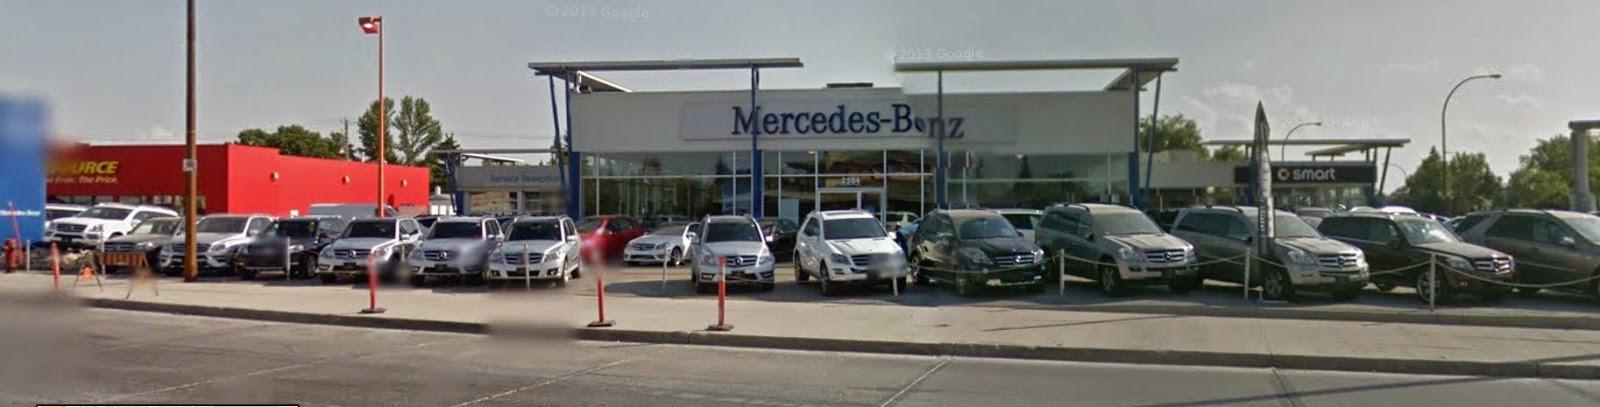 Mercedes benz winnipeg moving to kenaston college for Mercedes benz winnipeg